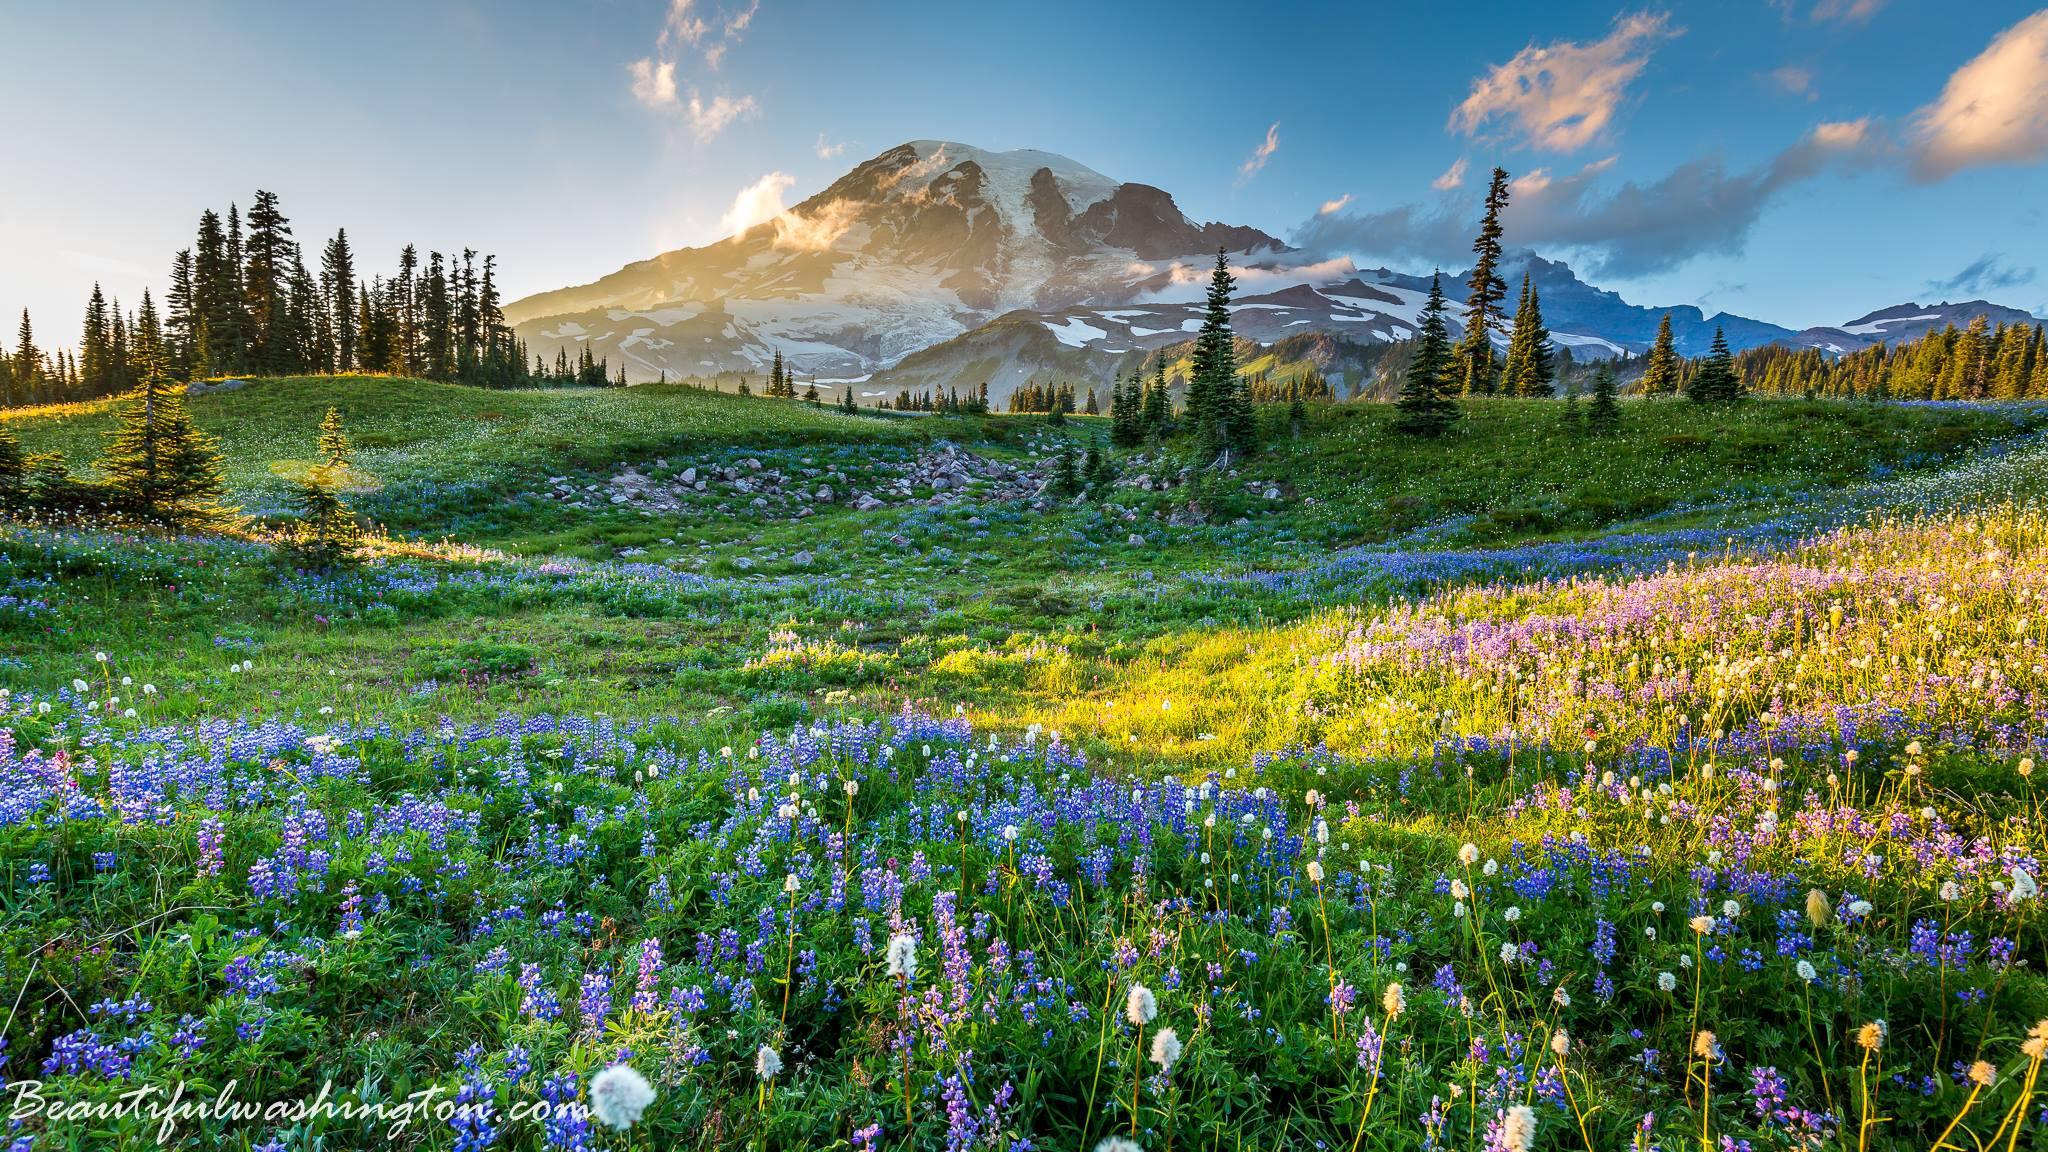 Seattle Washington Fall Skyline Wallpaper Mount Rainier Of Washington State Travel Guide